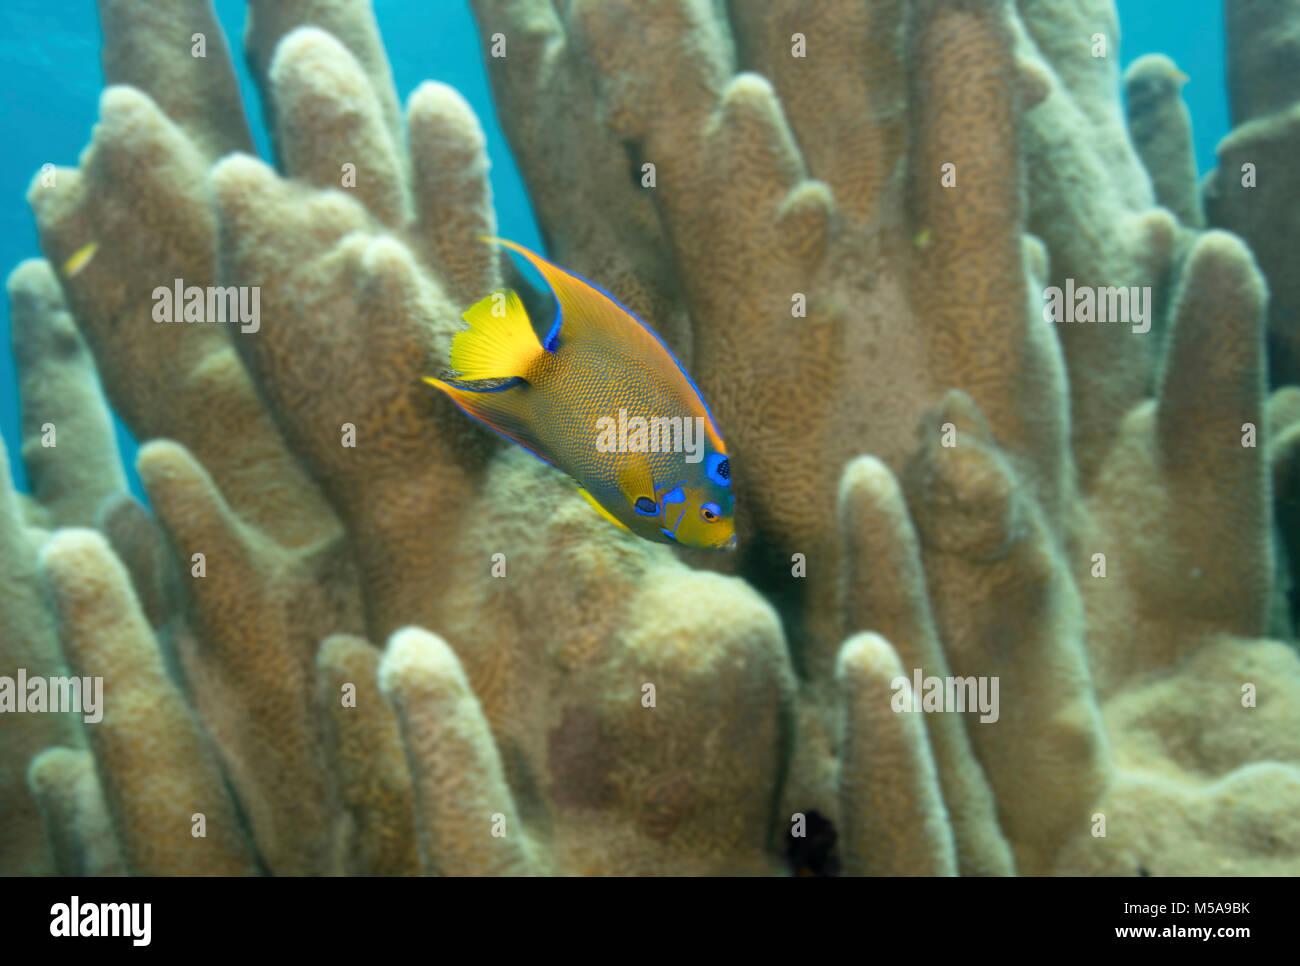 Queen angelfish swimming through Pillar coral. - Stock Image